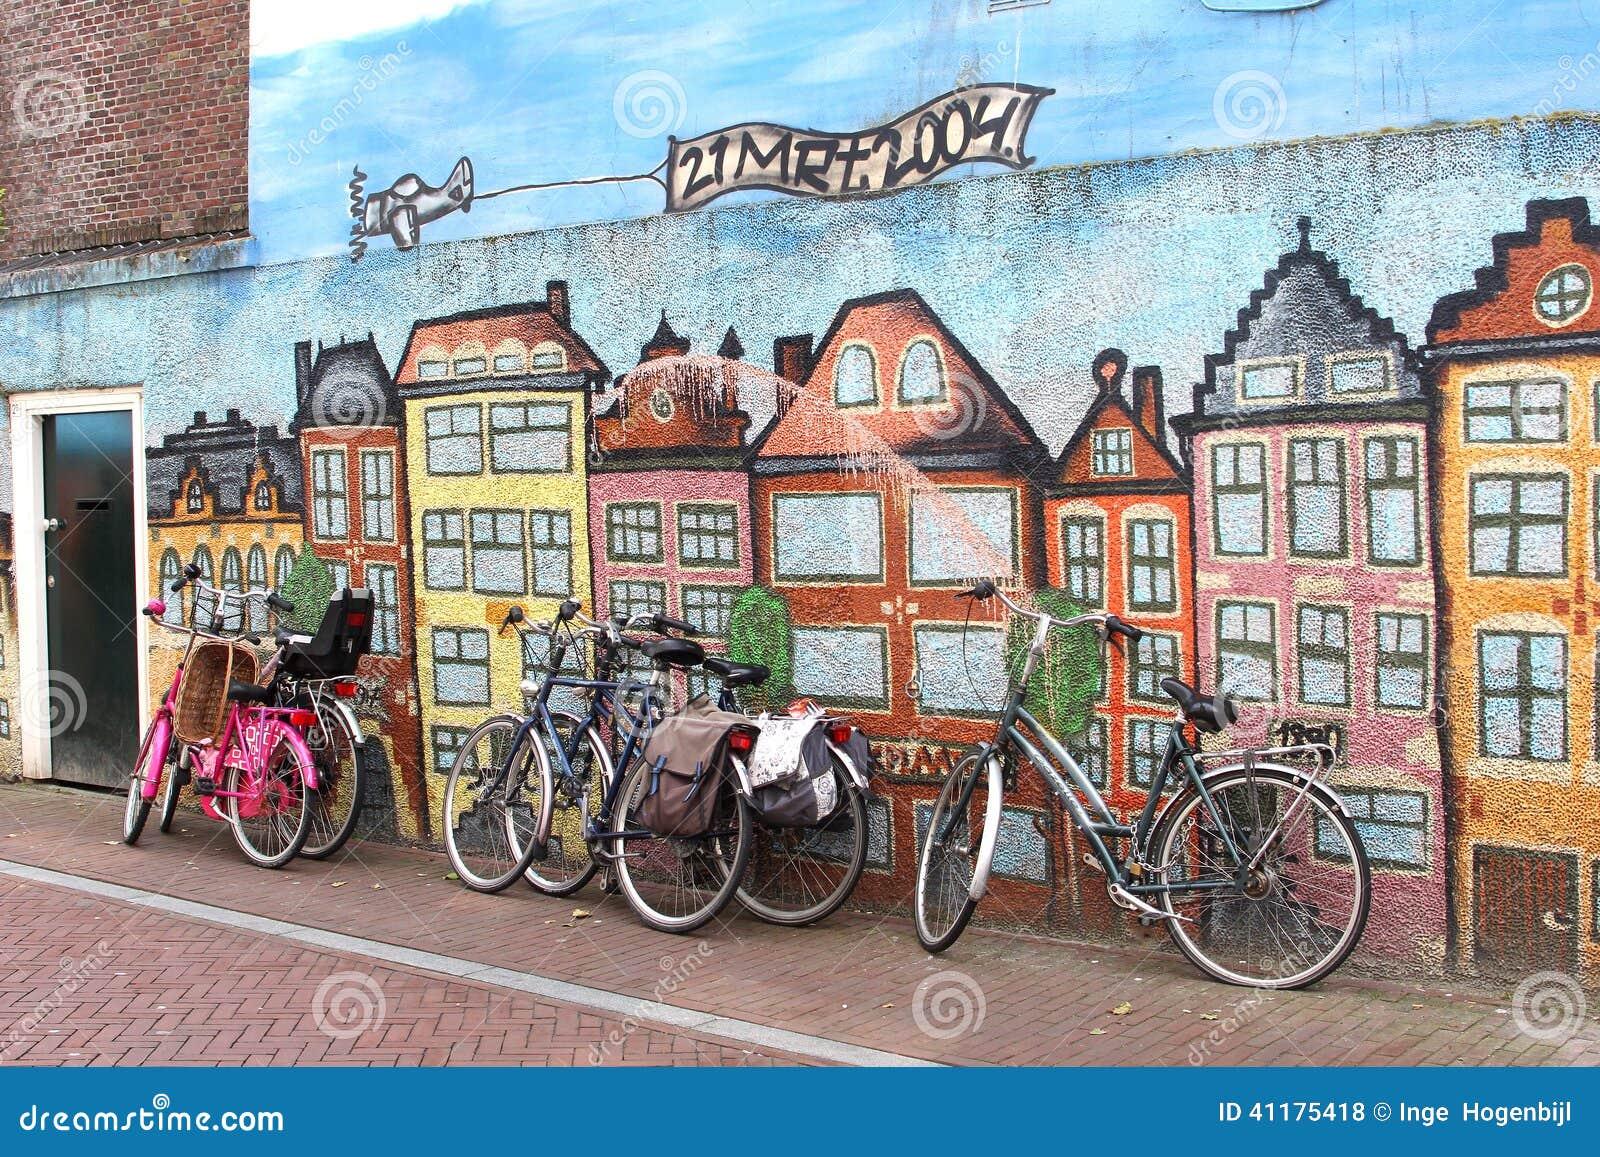 Graffiti wall amsterdam - Editorial Stock Photo